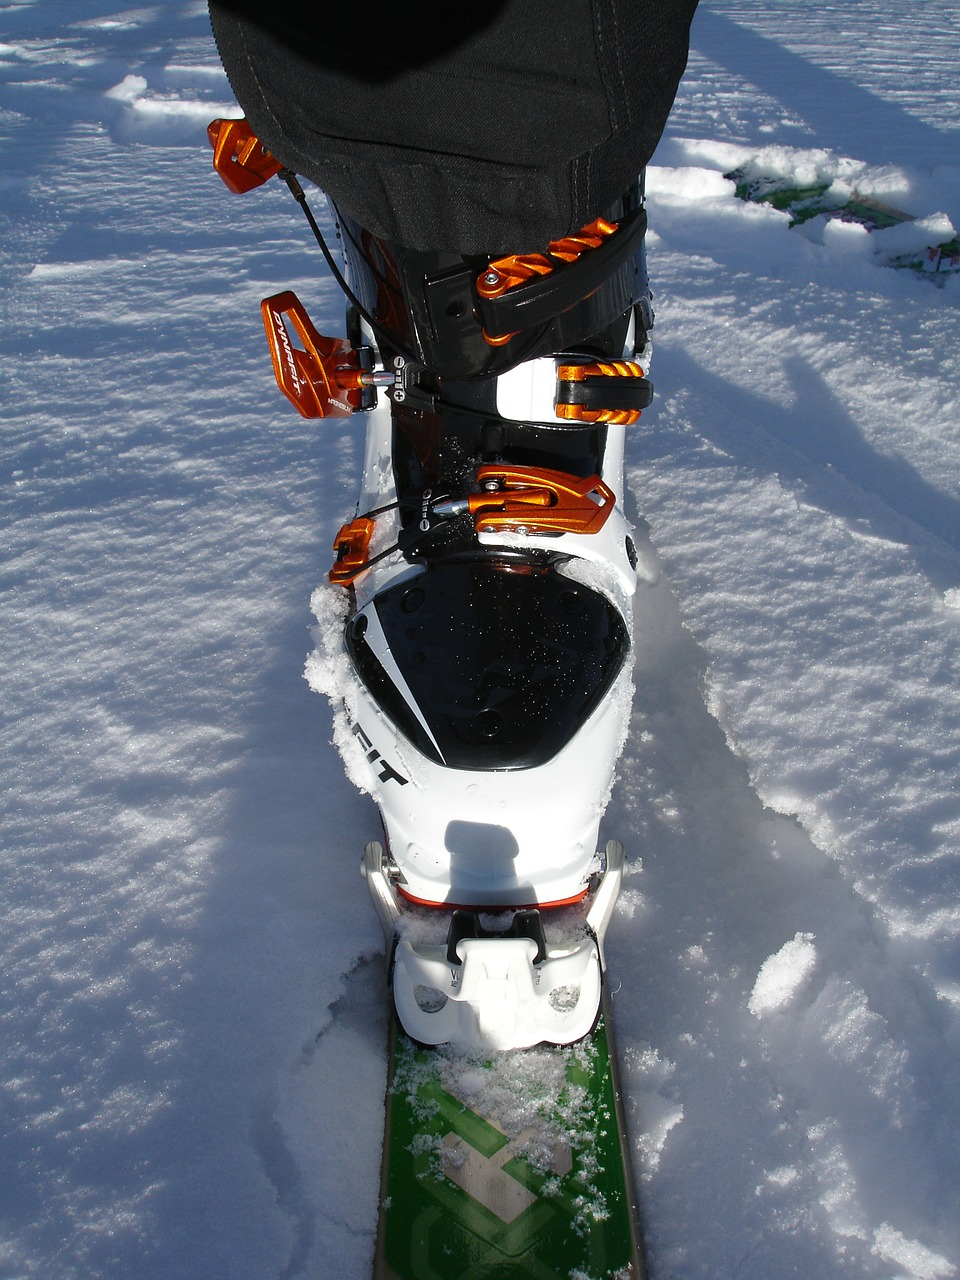 Crystal Ski Owner